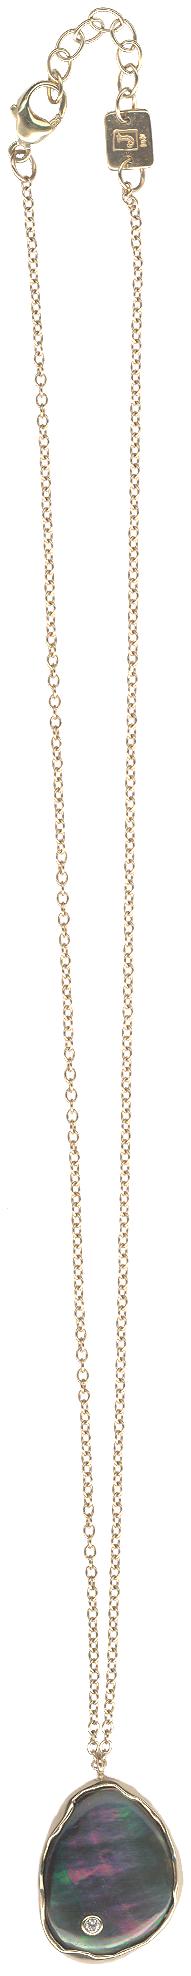 jj_necklace